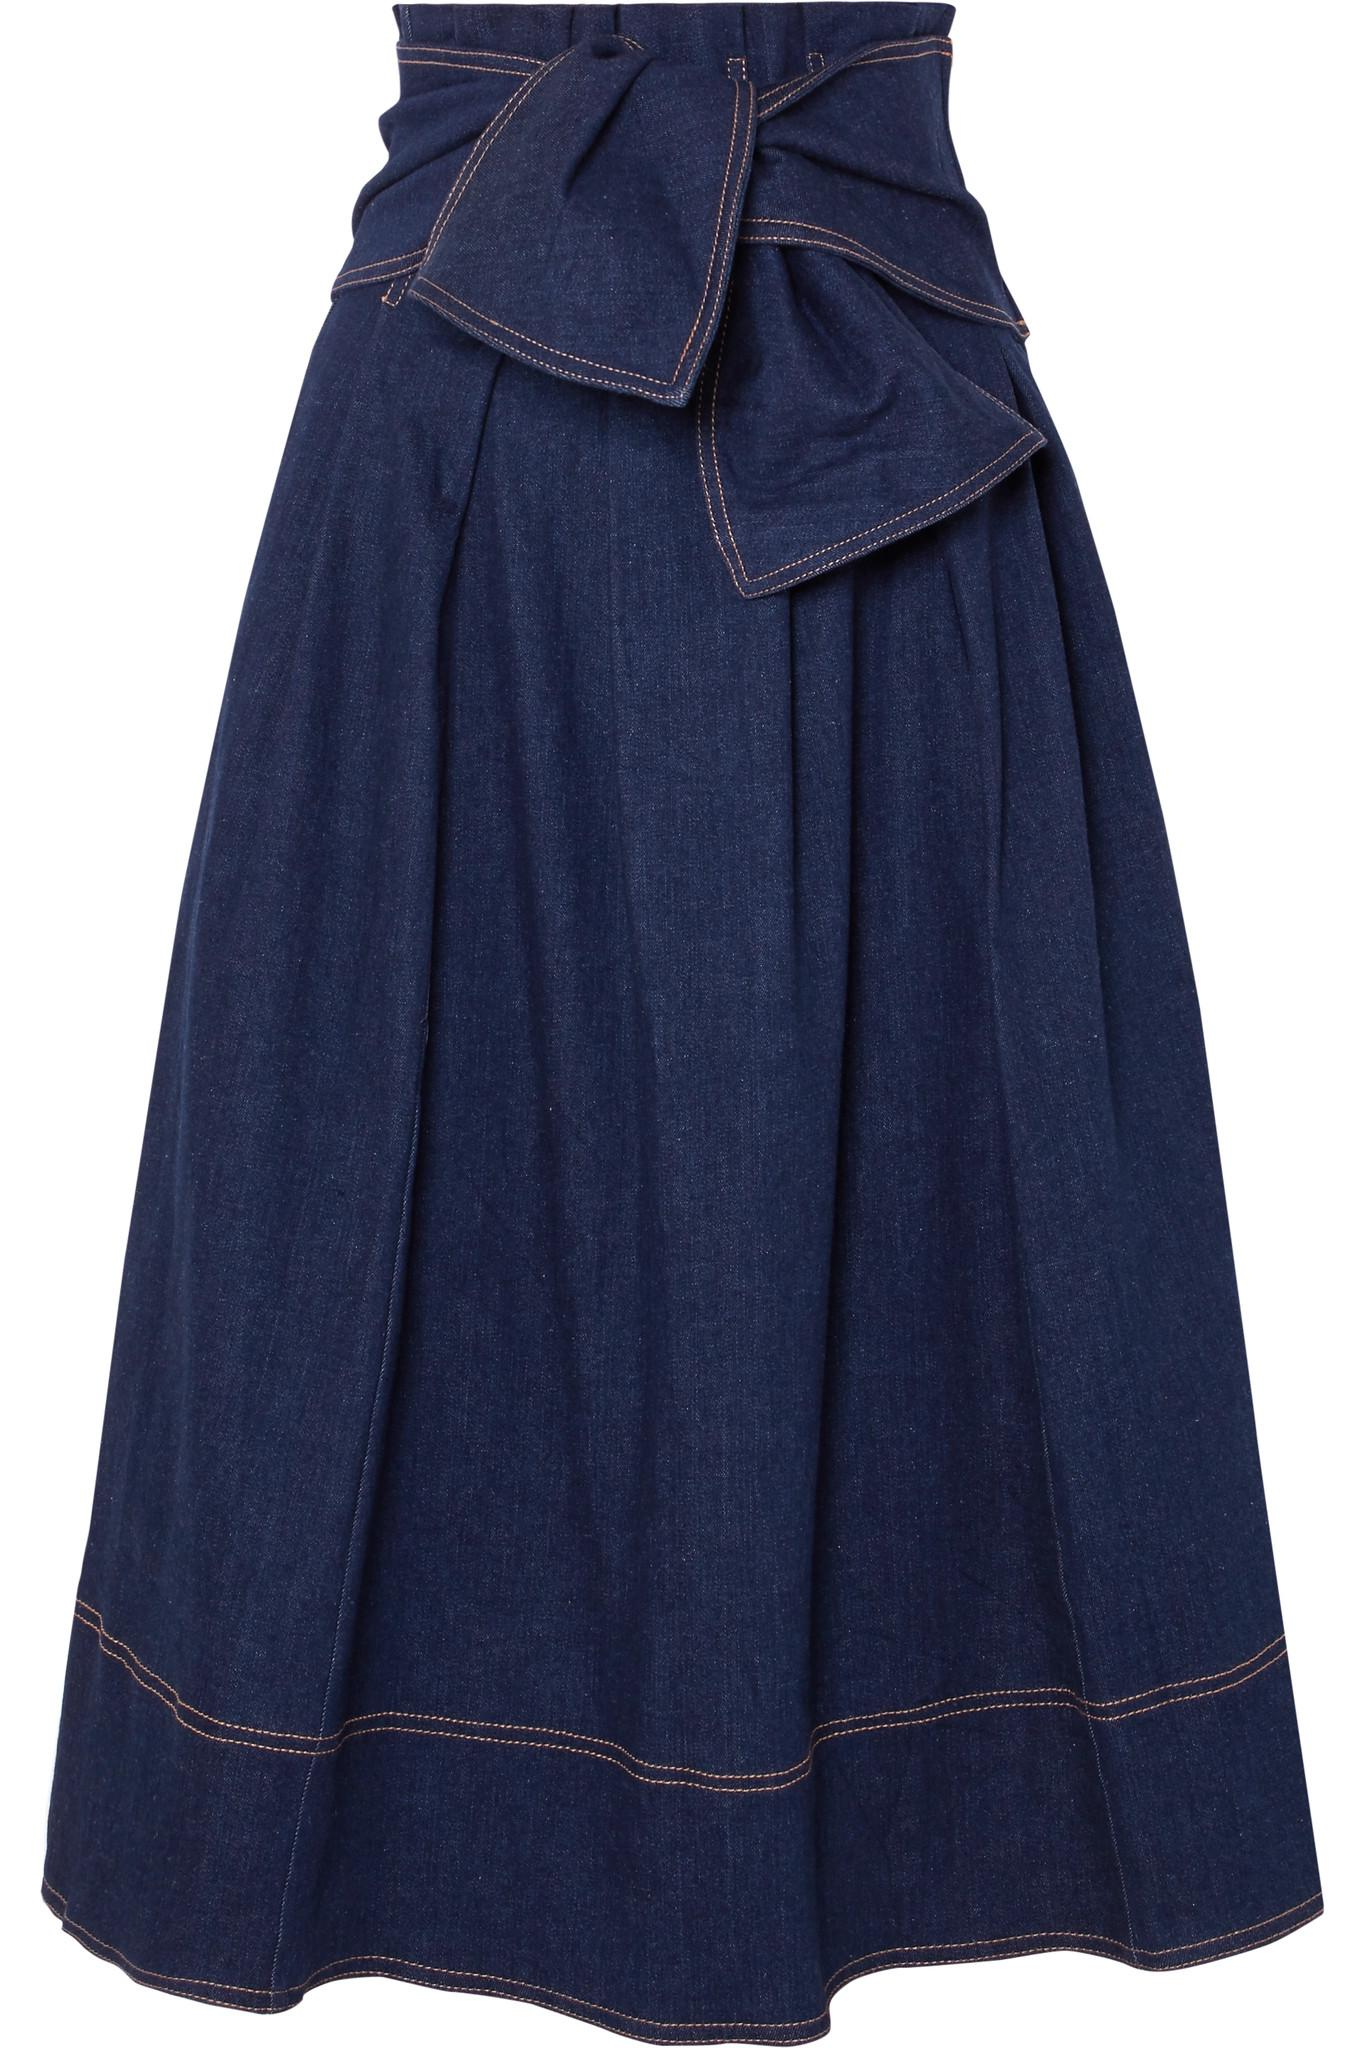 b247414ea6ea Ulla Johnson Virgil Skirt in Blue - Lyst